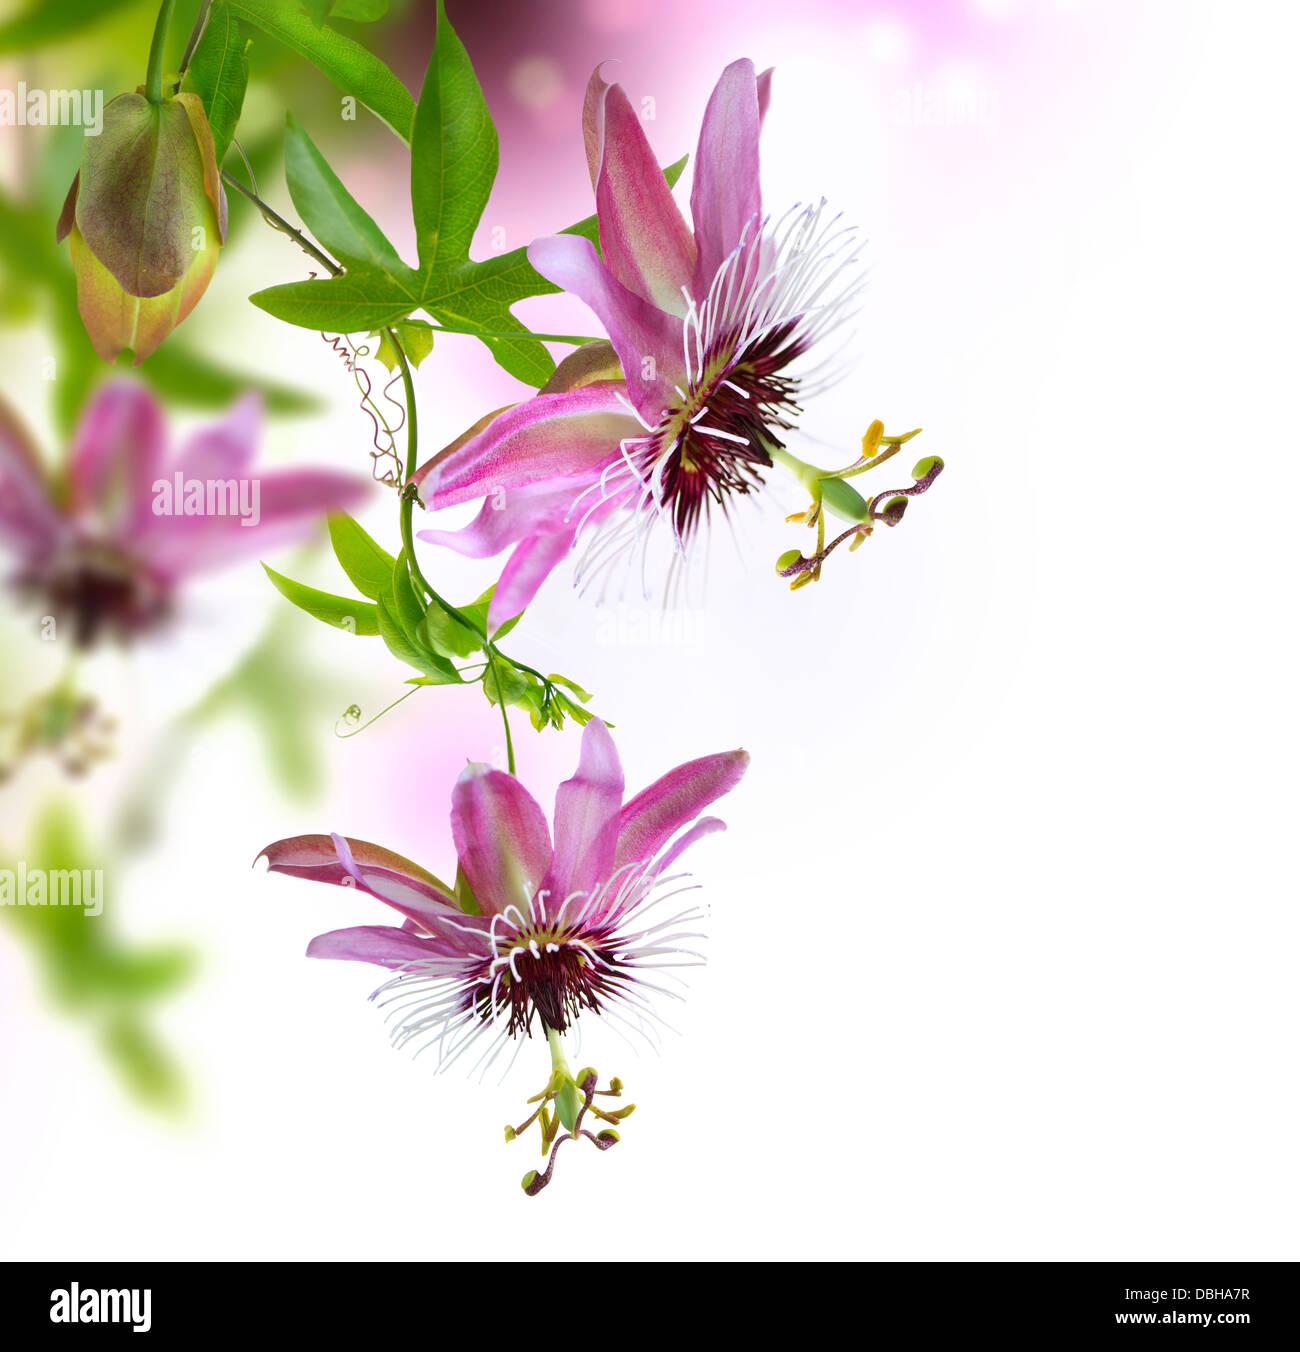 Passiflora Border Design Stock Photo 58773563 Alamy